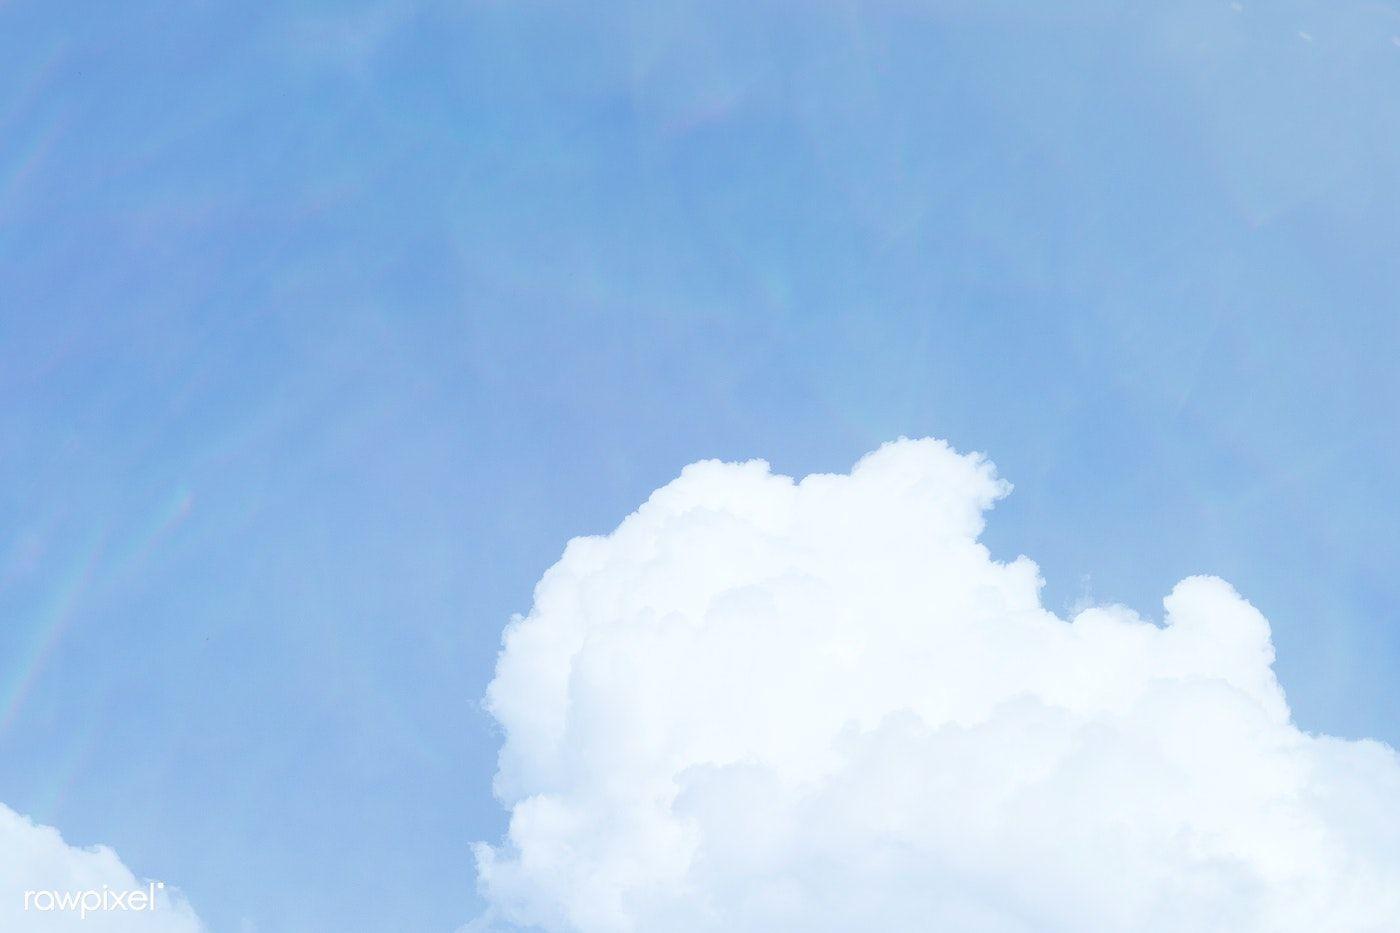 Download Premium Illustration Of Cloud Patterned Blue Sky Background Blue Sky Background Clouds Pattern Clouds